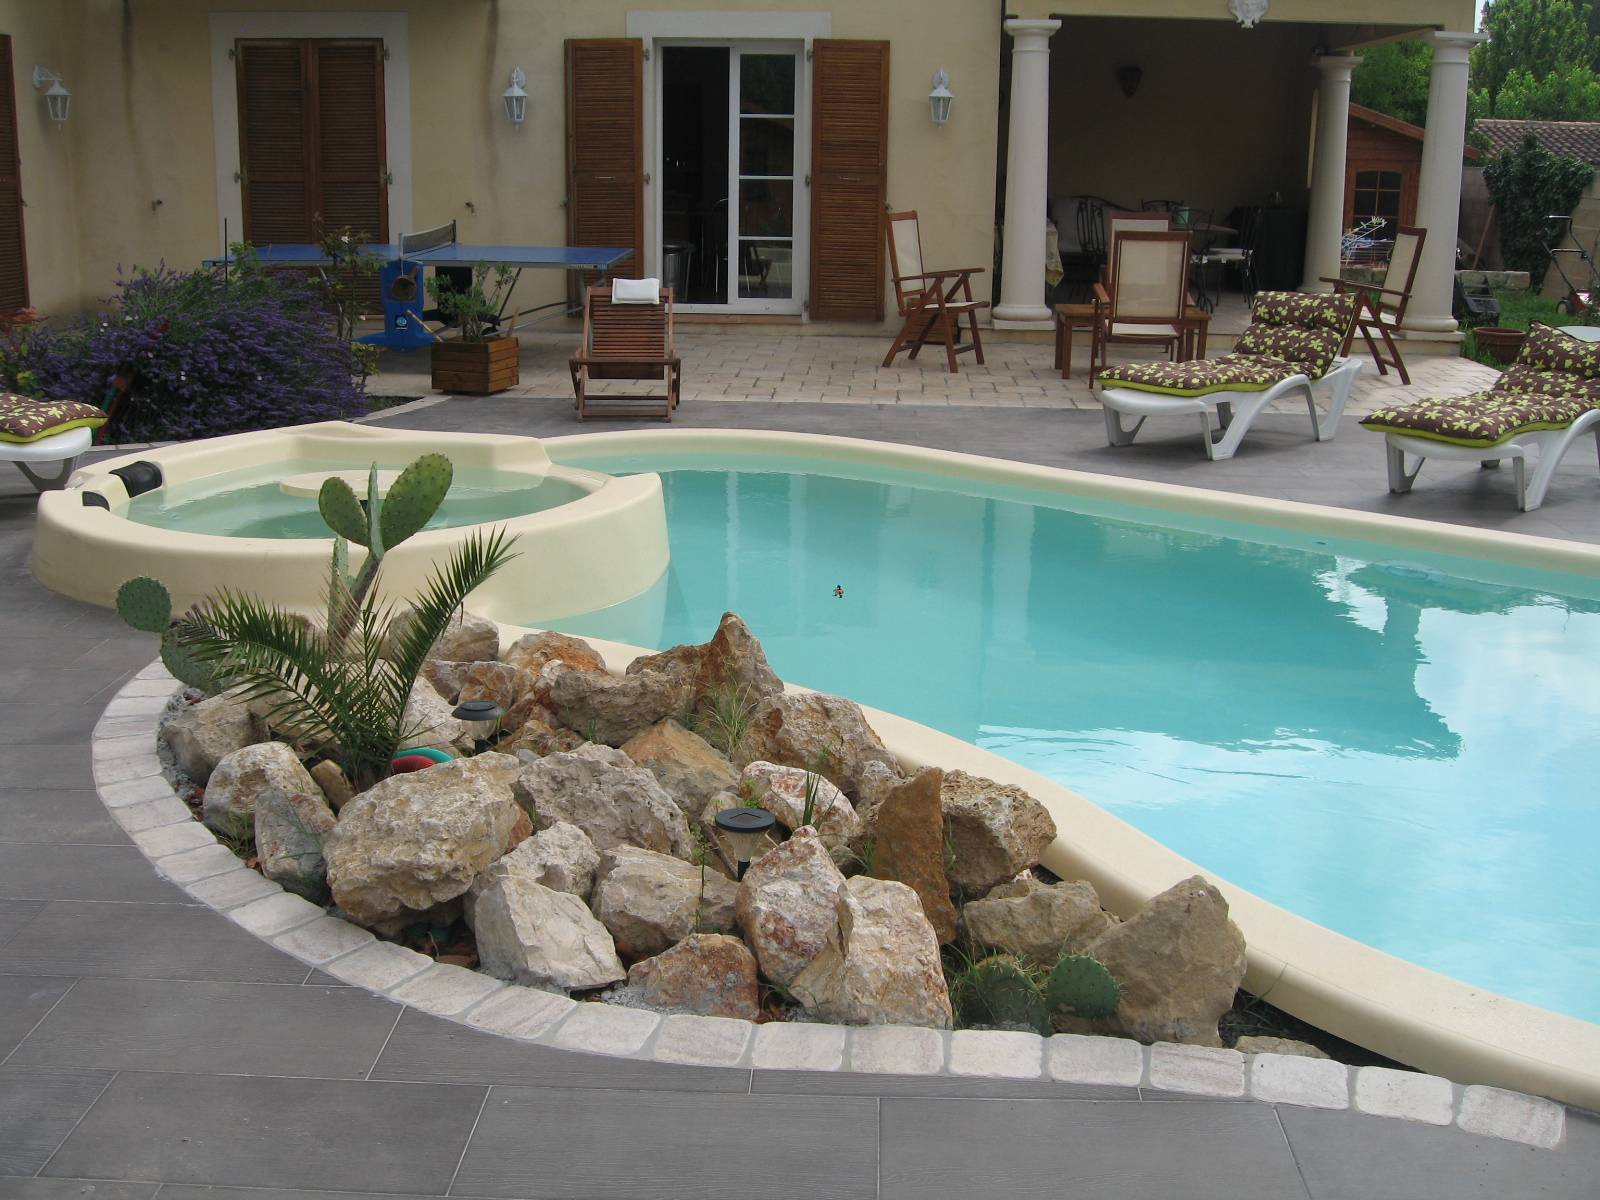 Piscine coque polyester mod le tropicana spa sp cialiste de la piscine coque montpellier - Piscine spa montpellier ...